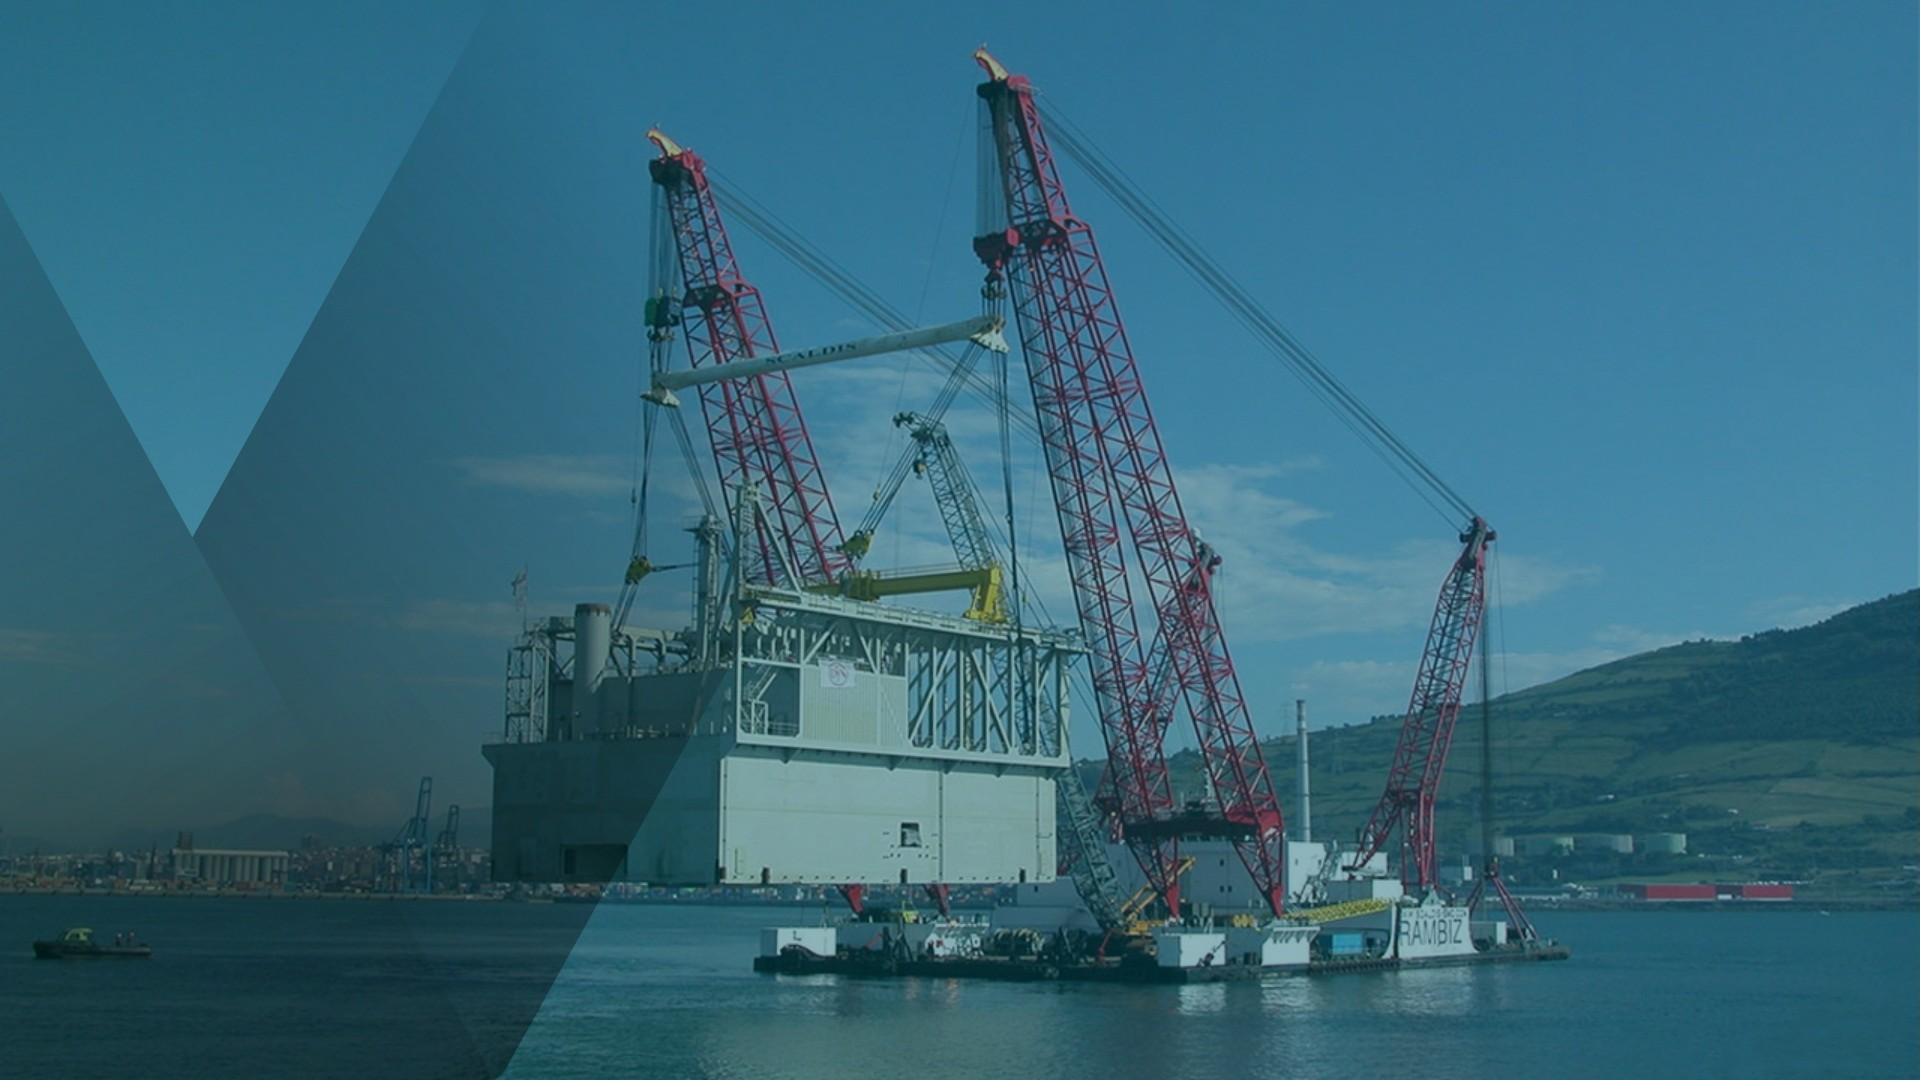 Image: Mining and fallpipe vessel Simon Stevin